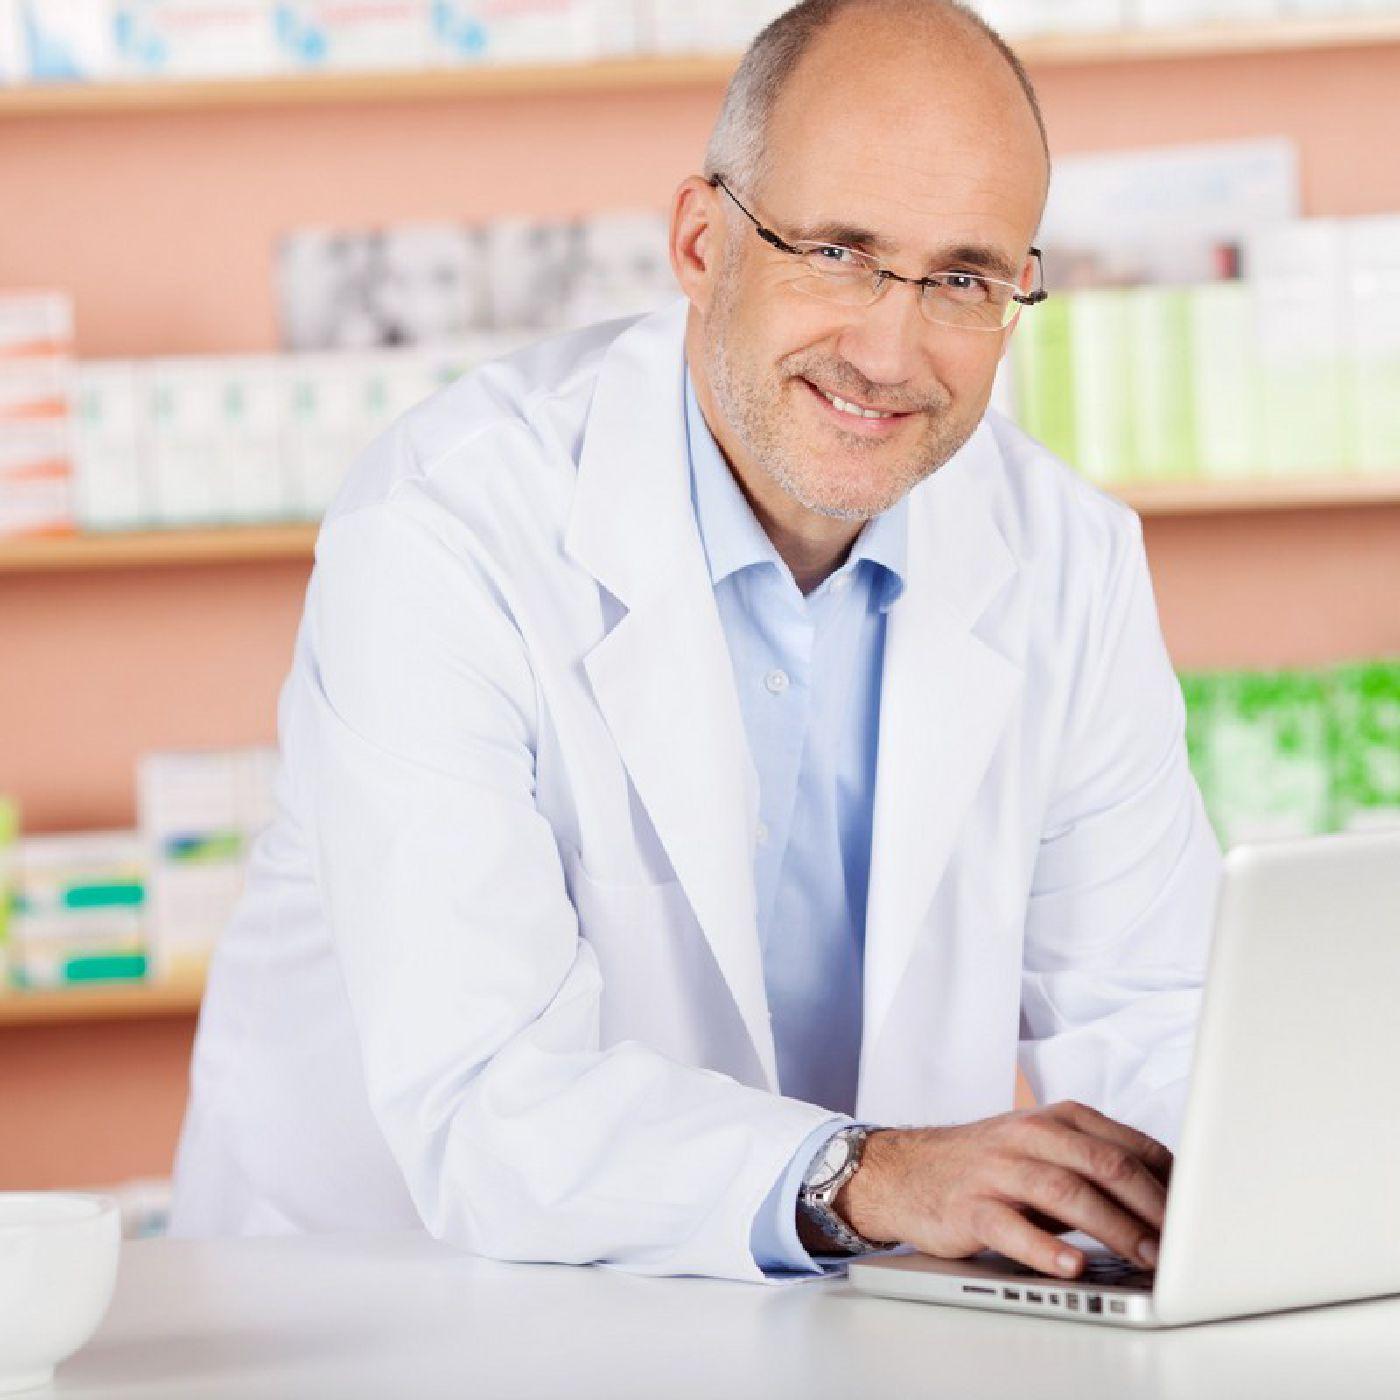 pharmagram suisse commandez vos m dicaments sur ordonnance en ligne. Black Bedroom Furniture Sets. Home Design Ideas